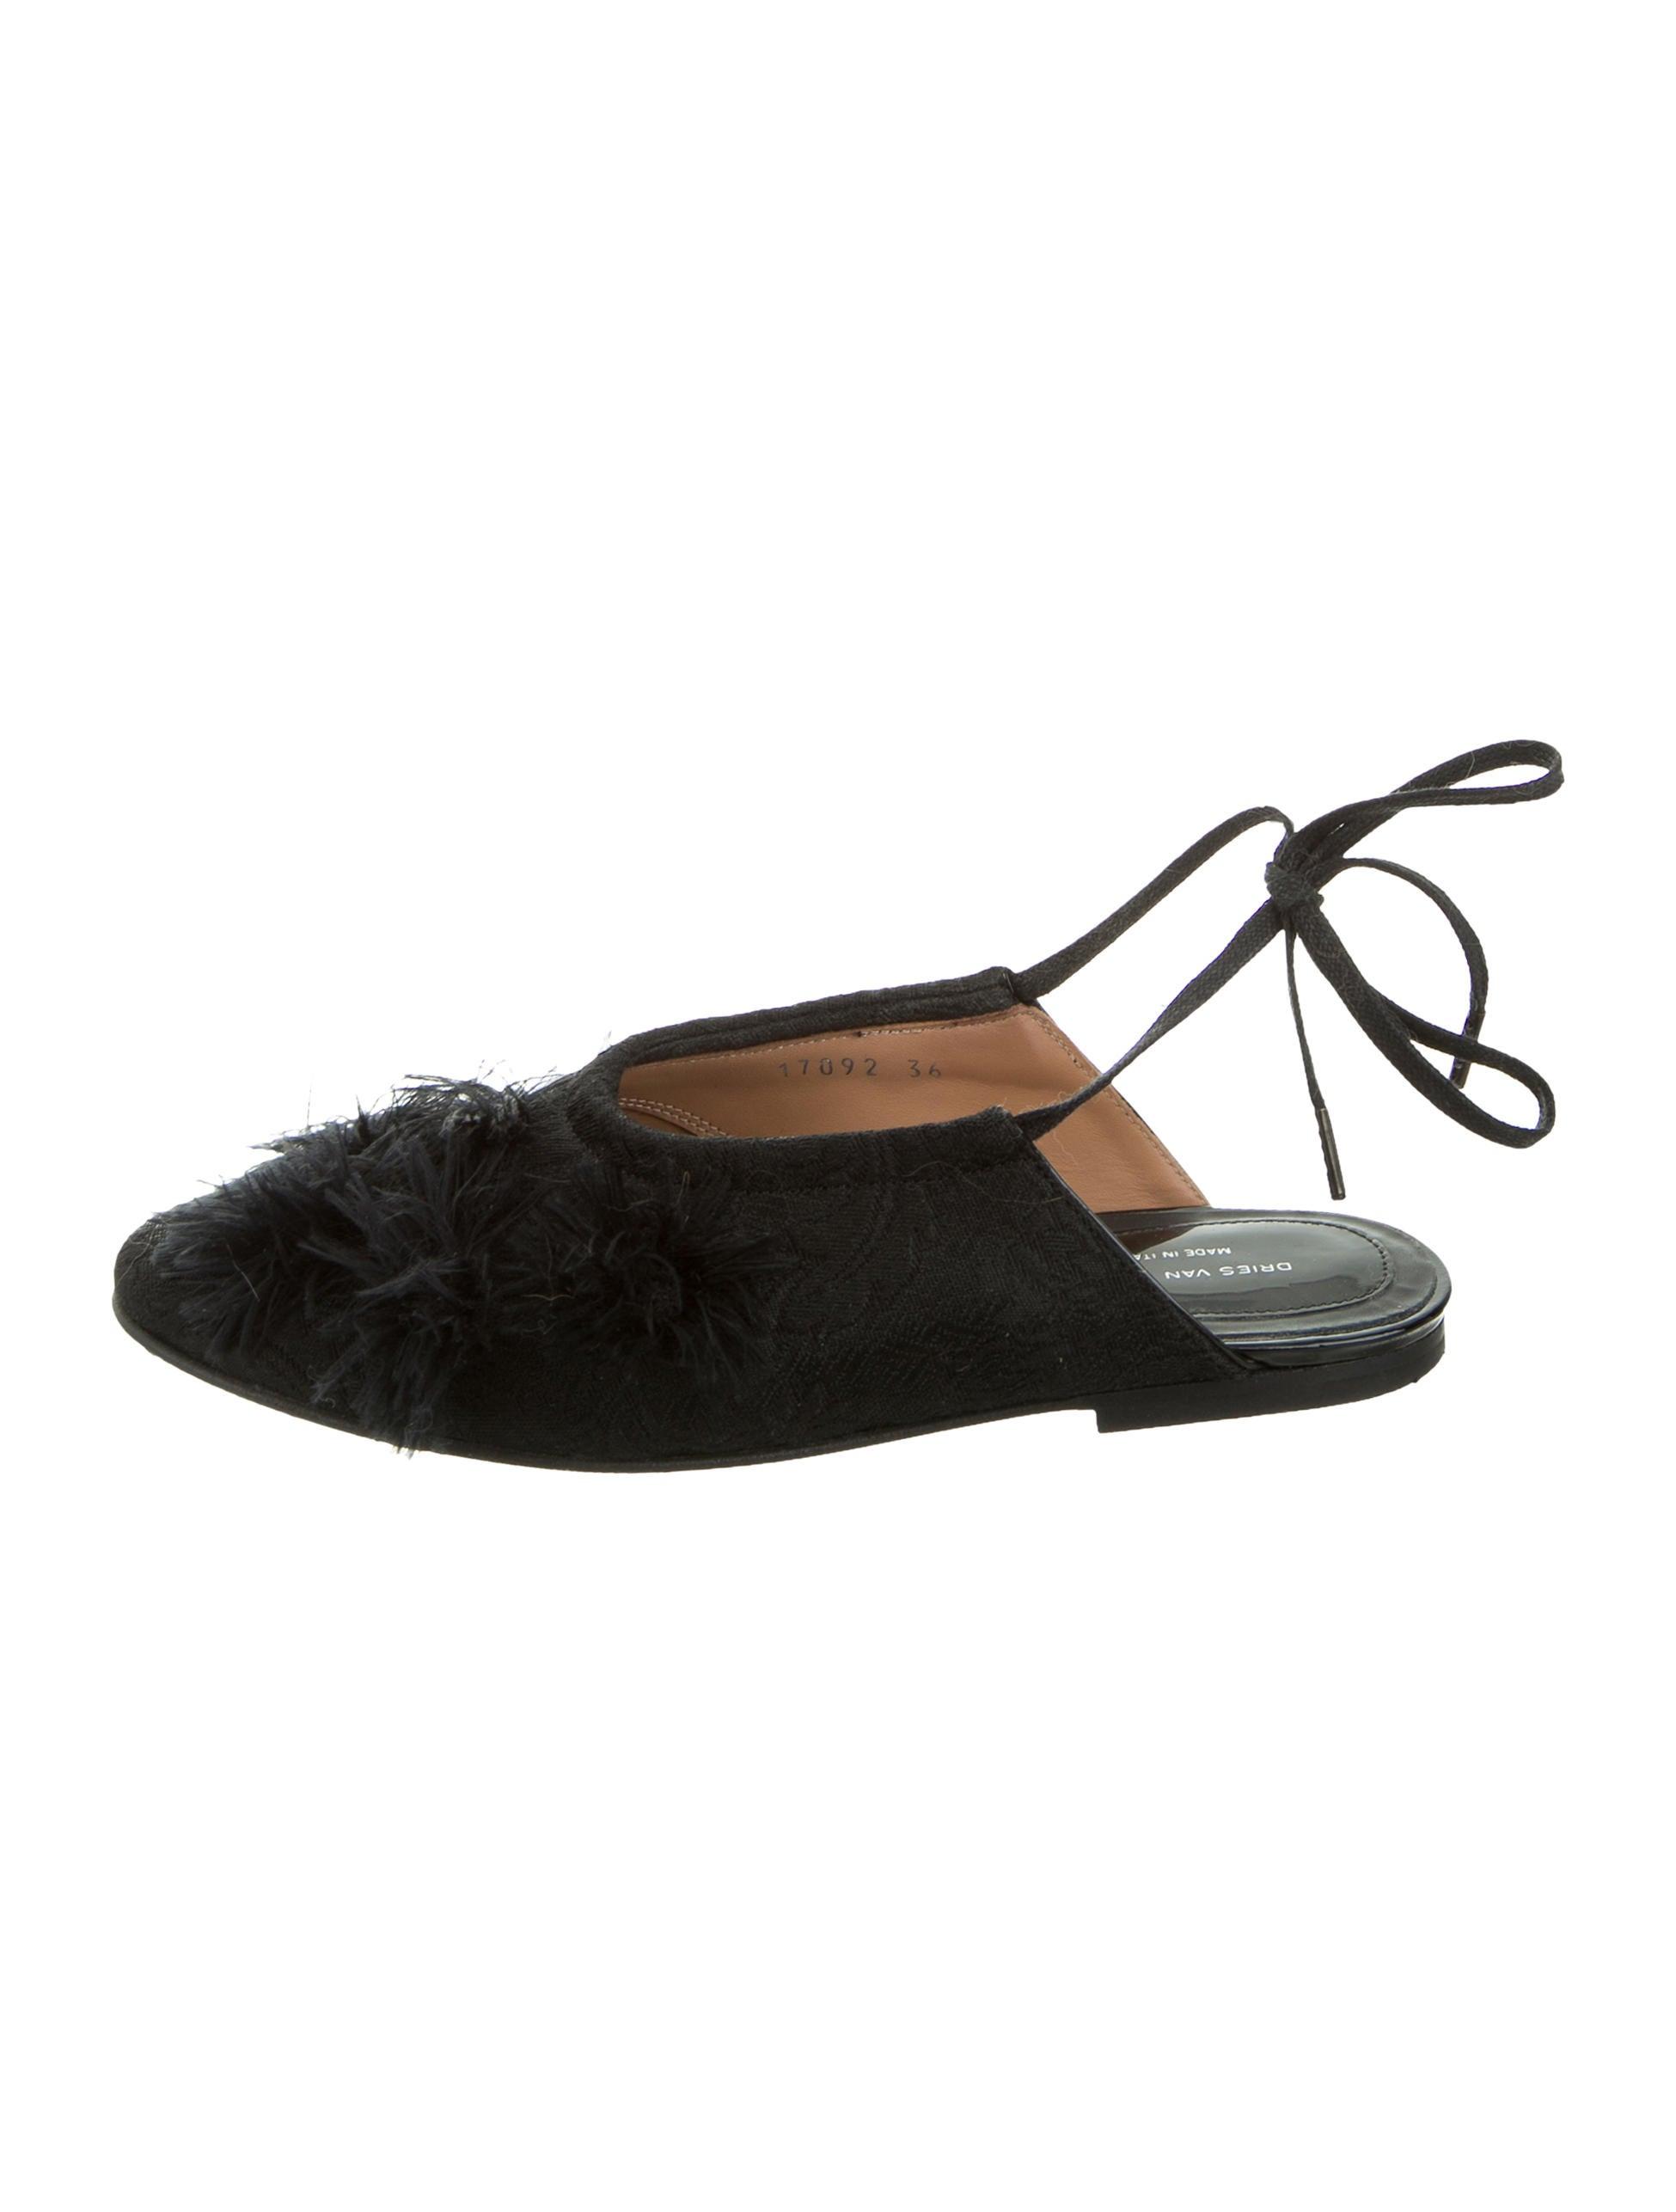 c76dafc7ae Dries Van Noten Woven Wrap-Around Flats - Shoes - DRI41735